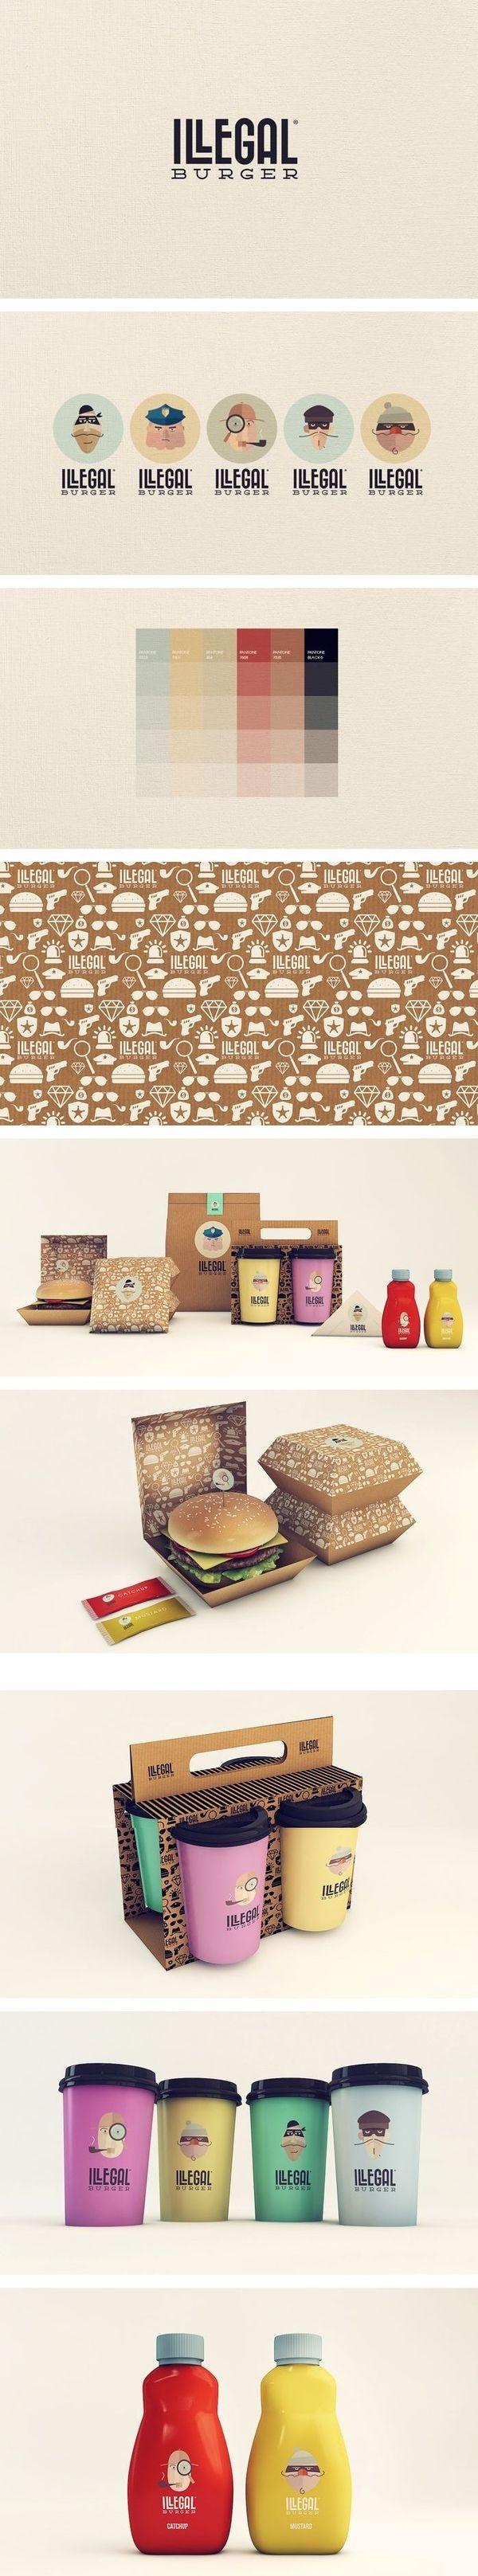 Illegal Burger | Isabella Rodriguez/Sweety Branding Studio #illustration #branding #burger #thief